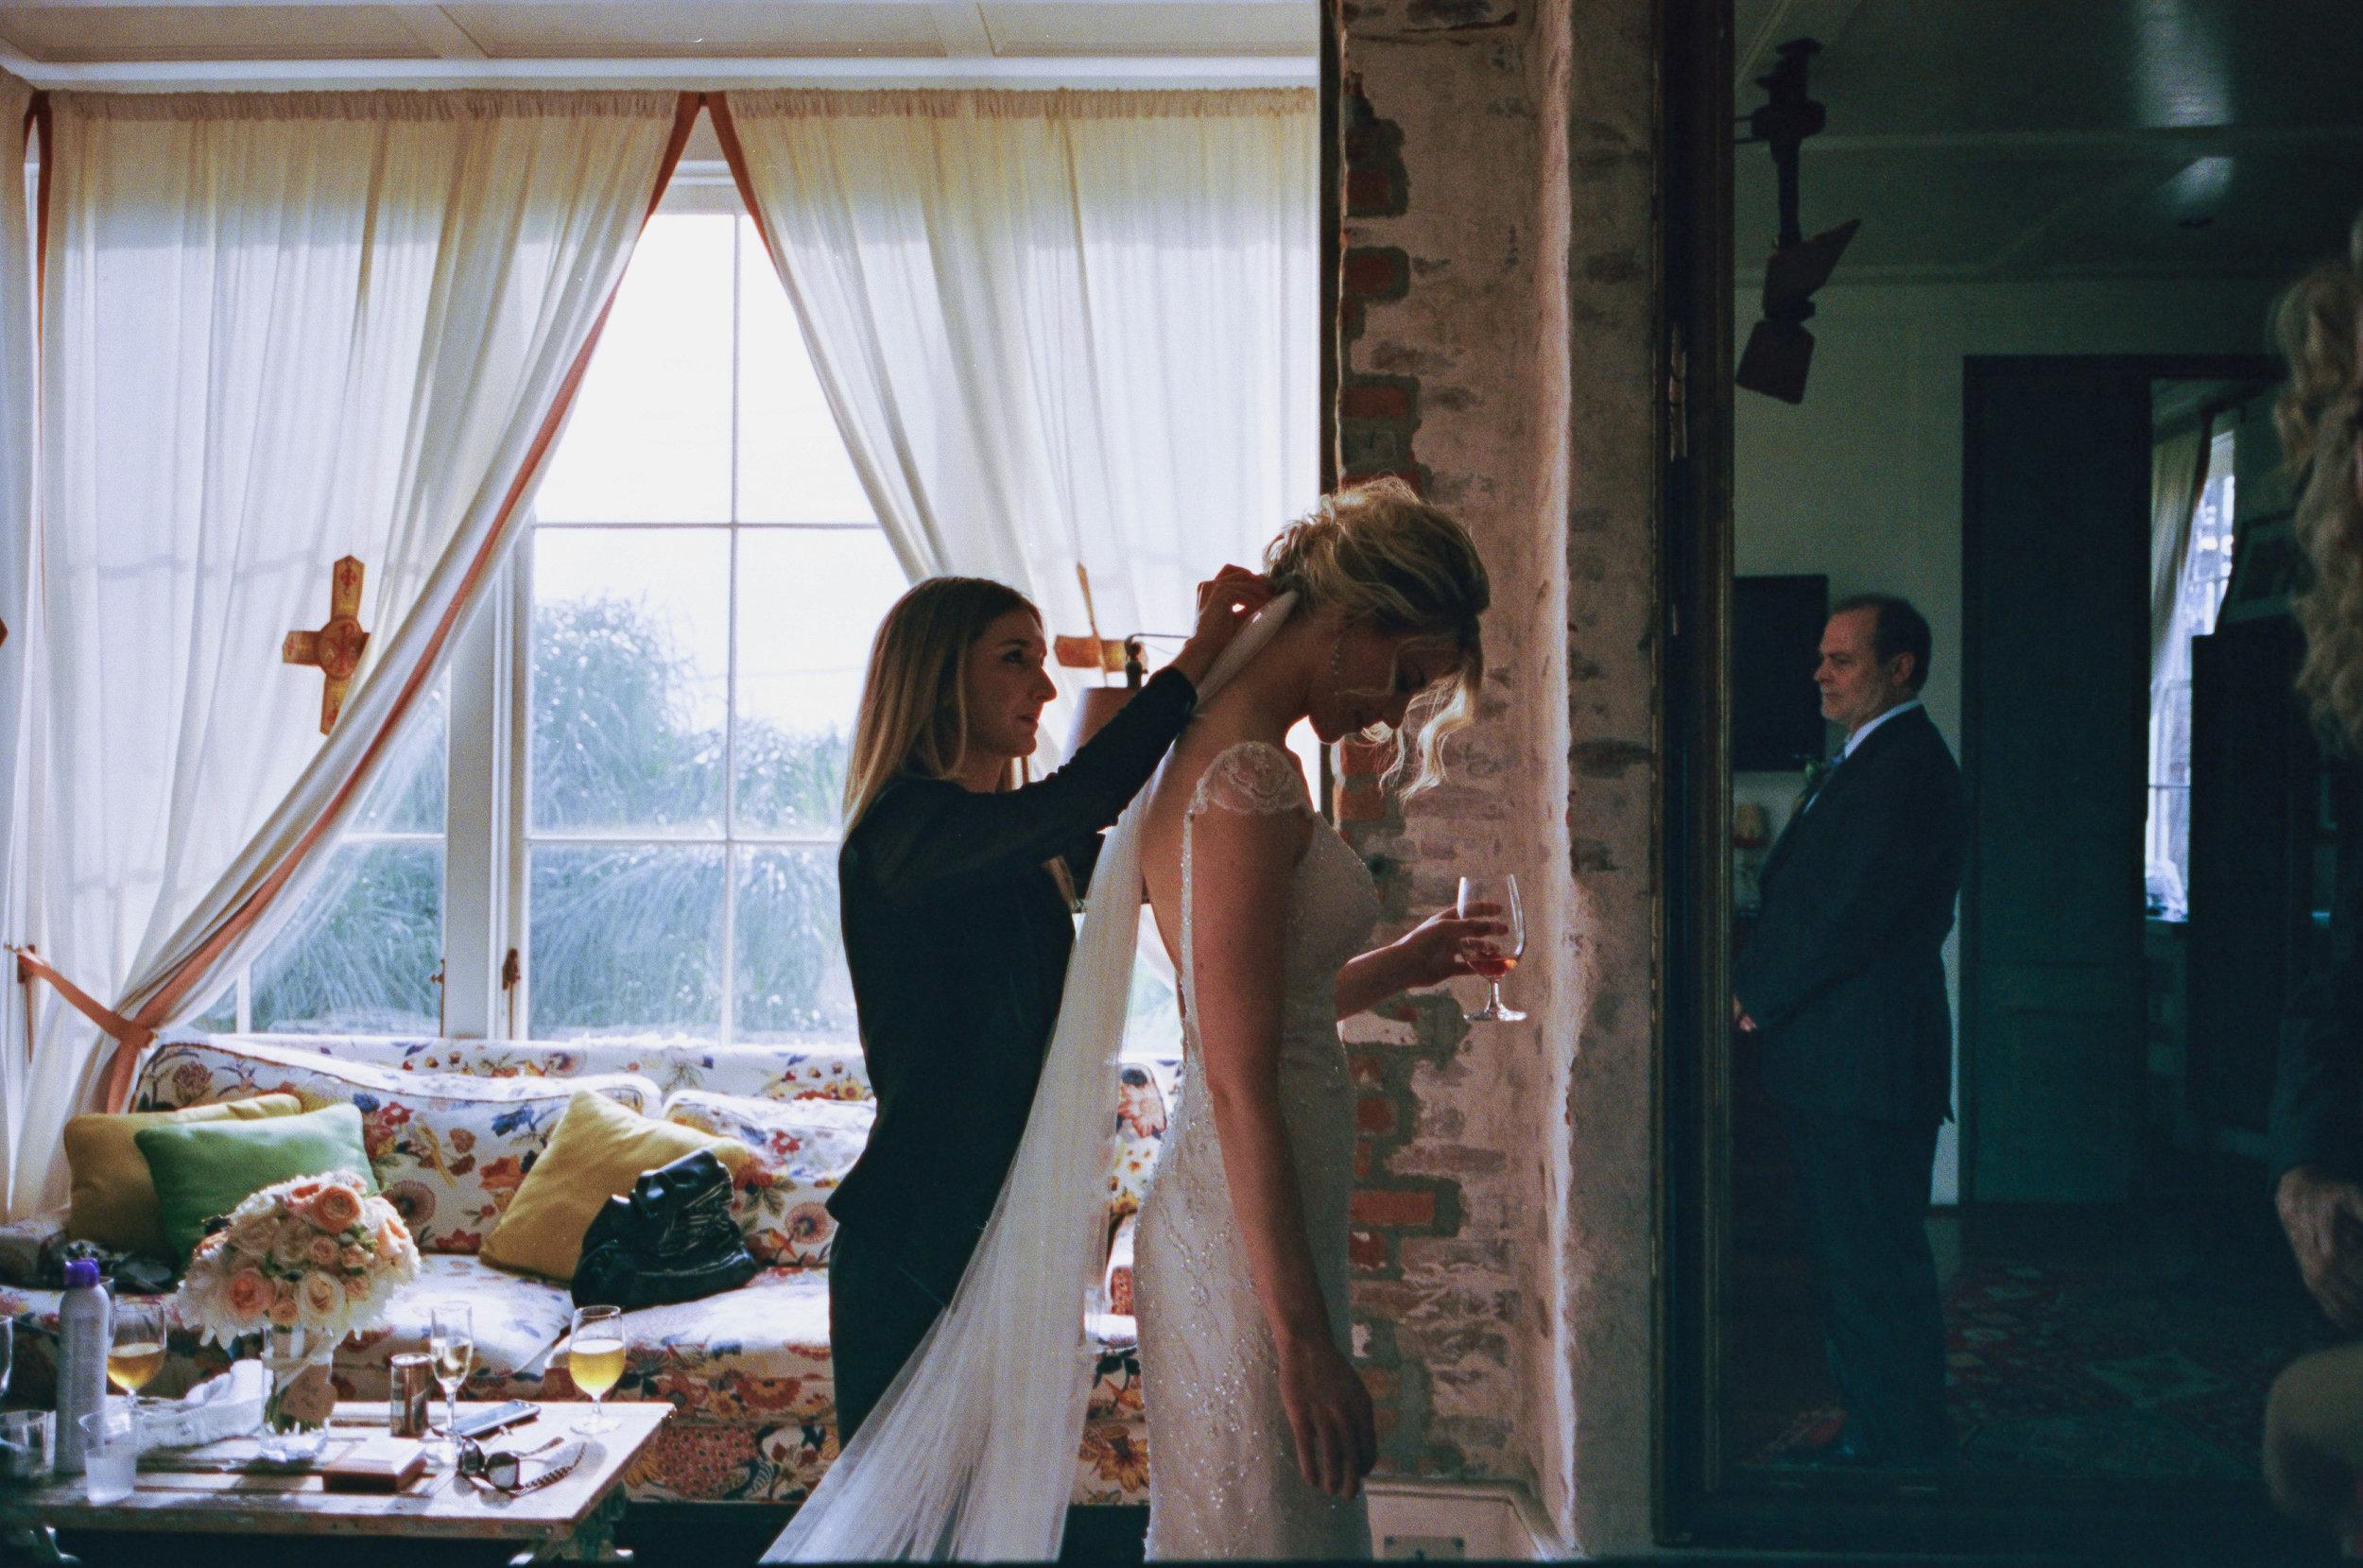 portra_400_film_wedding_chellise_michael_photography-31.jpg